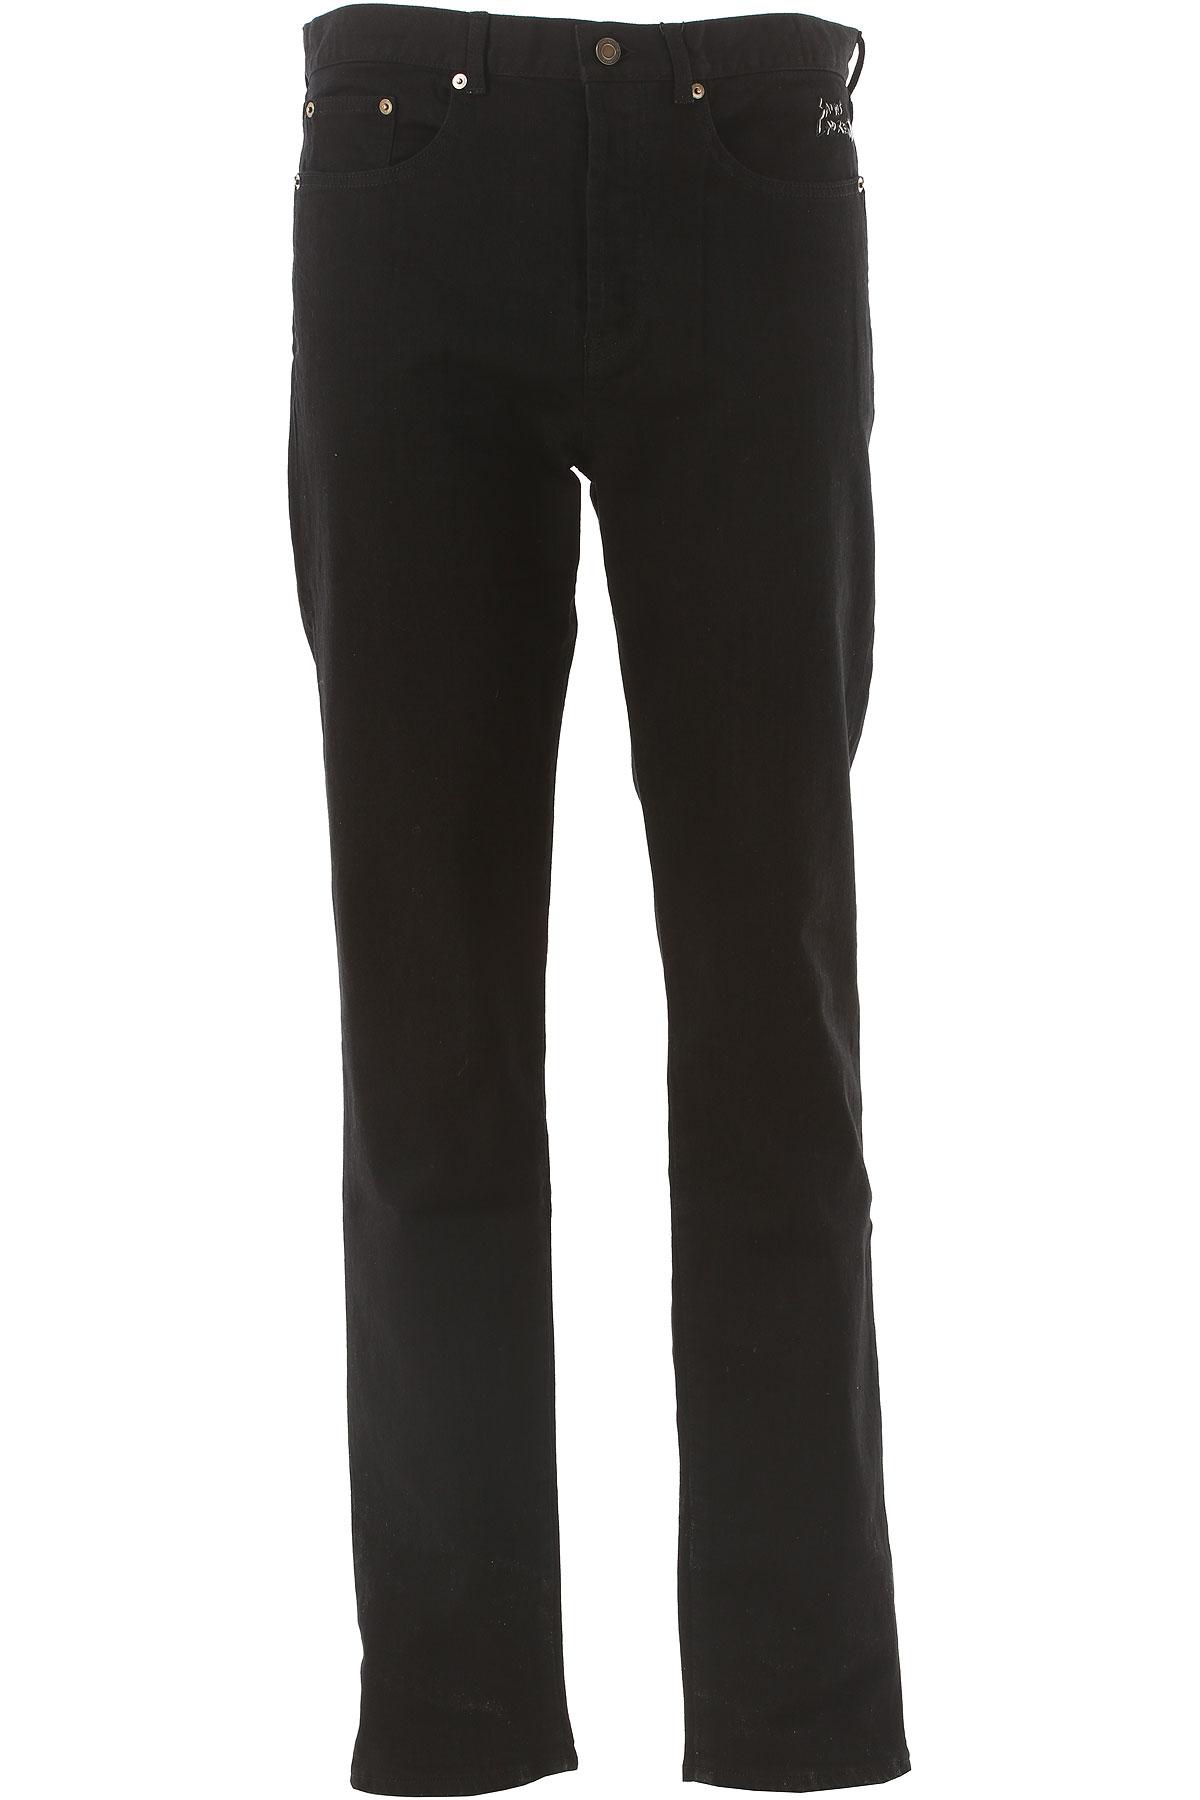 Yves Saint Laurent Jeans On Sale in Outlet, Black, Cotton, 2017, 29 30 32 33